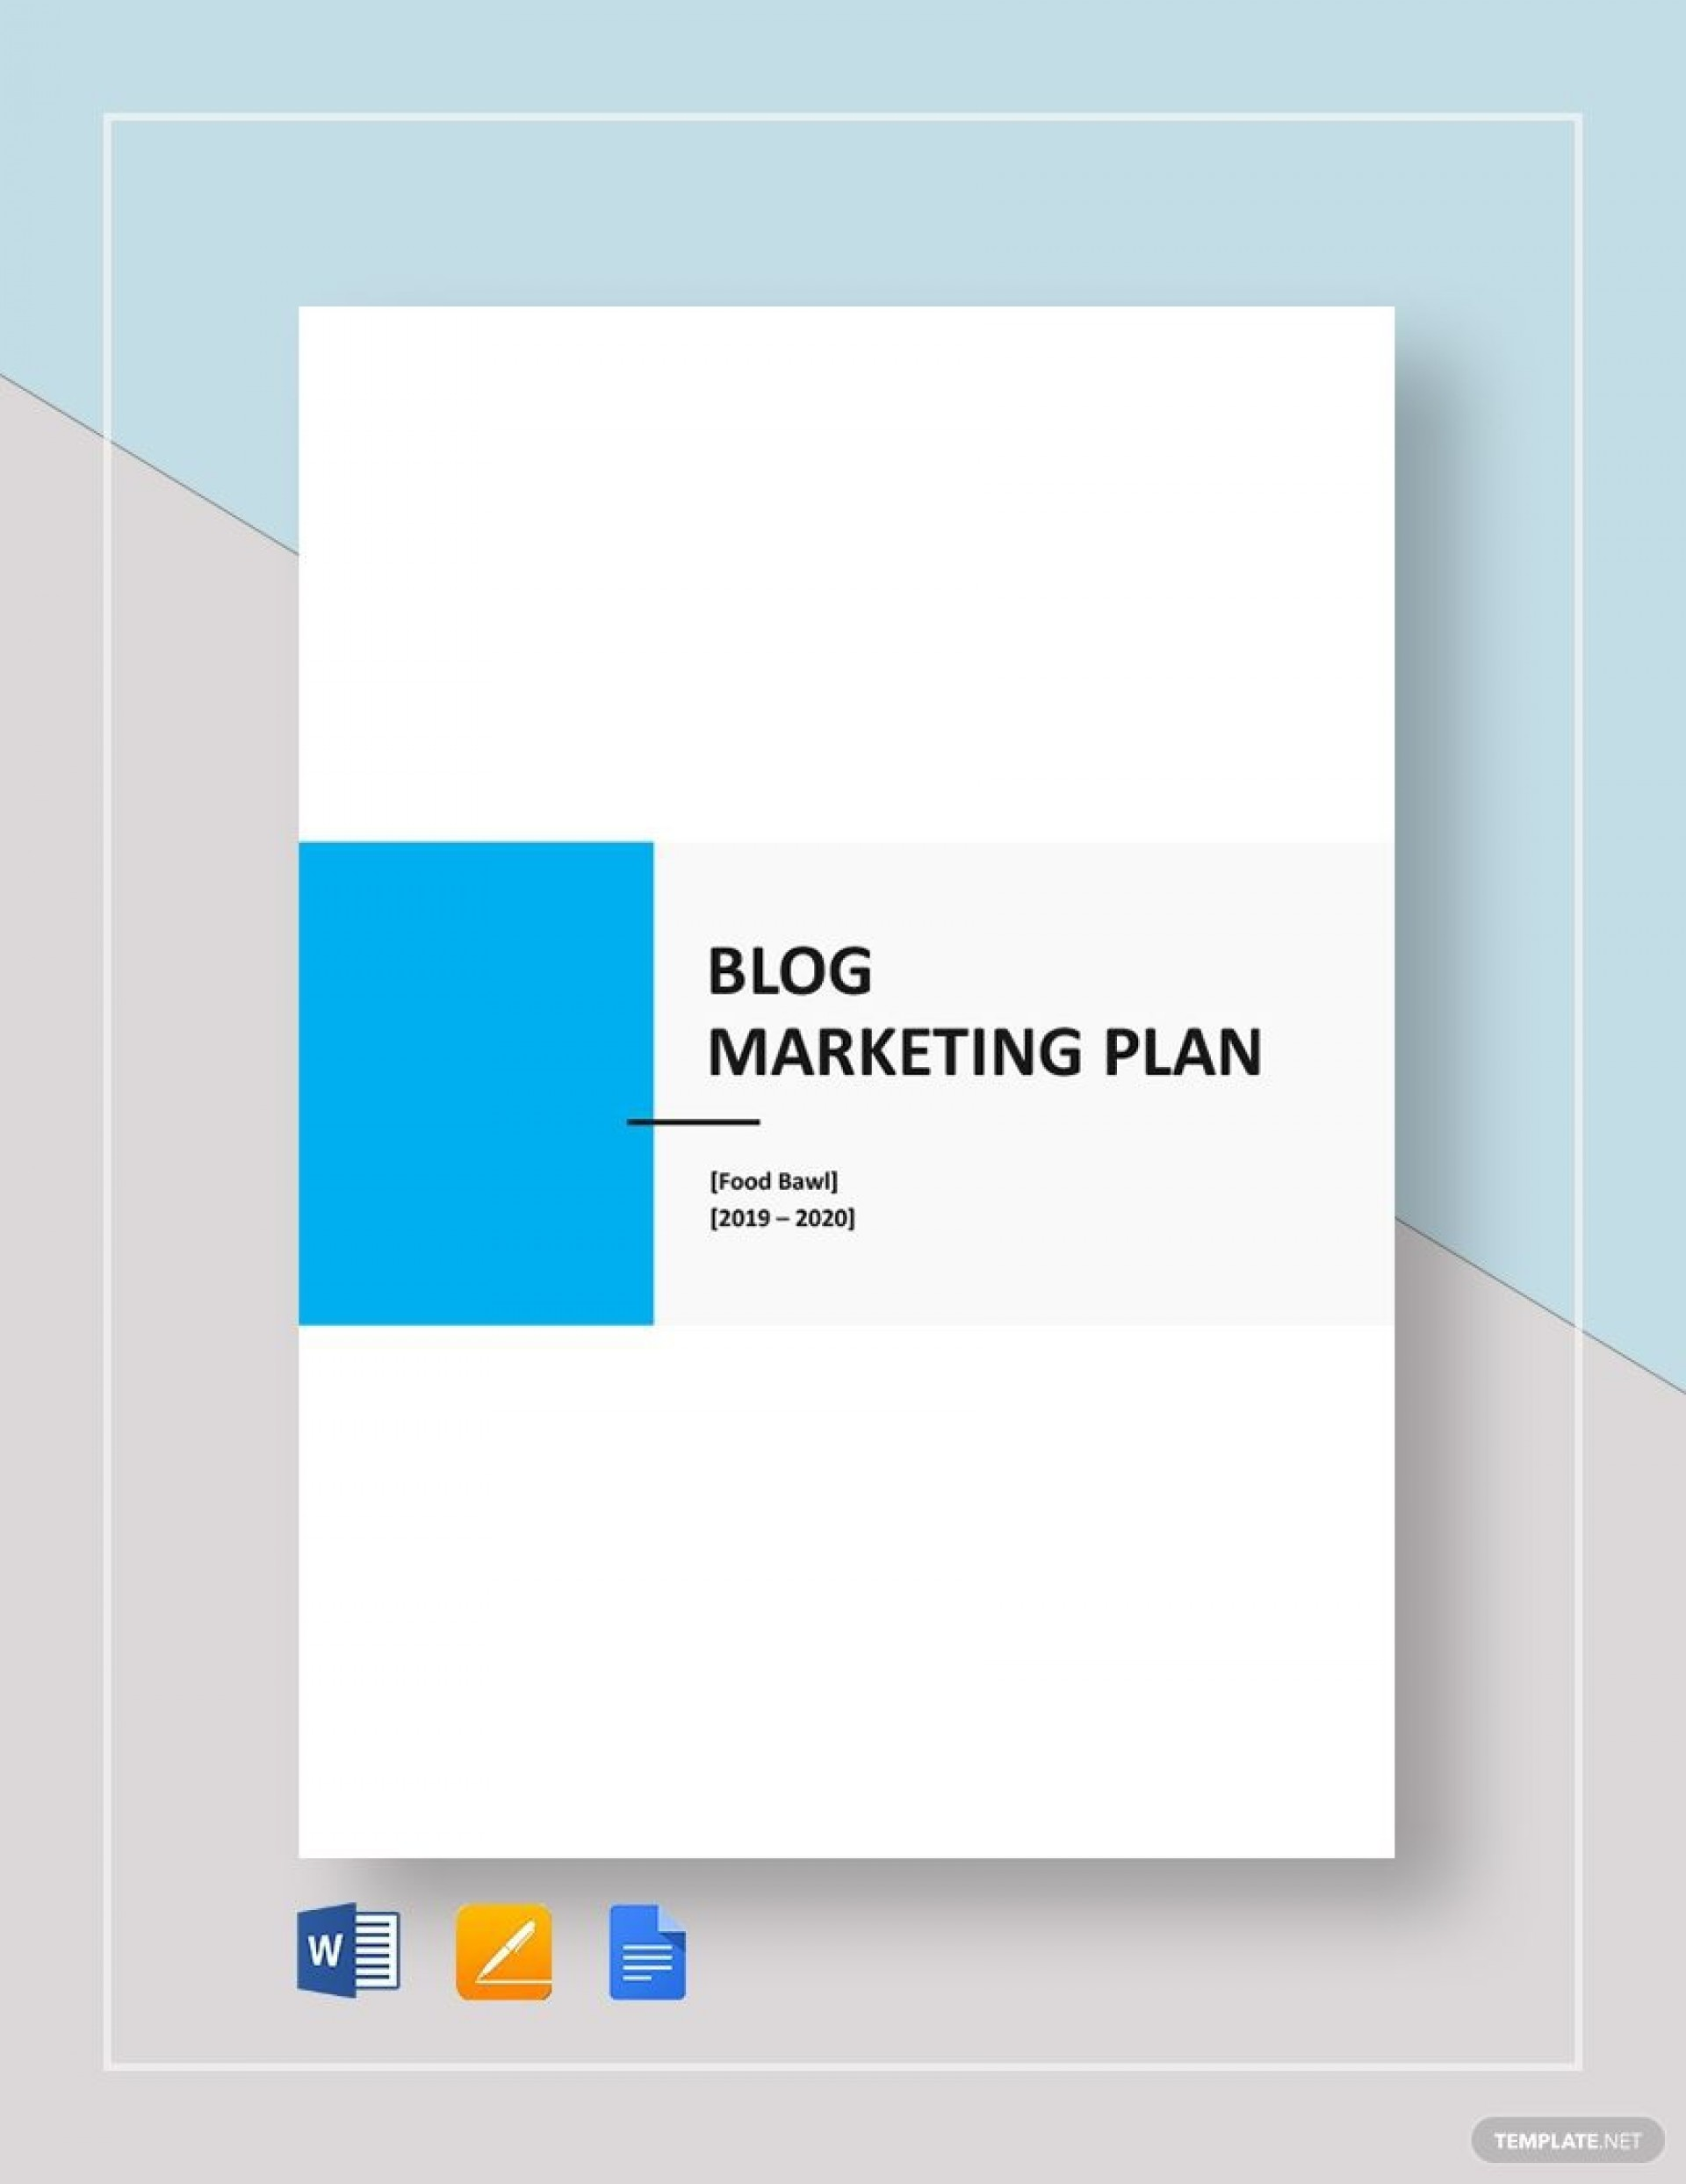 009 Excellent Social Media Marketing Plan Template Doc Idea 1920